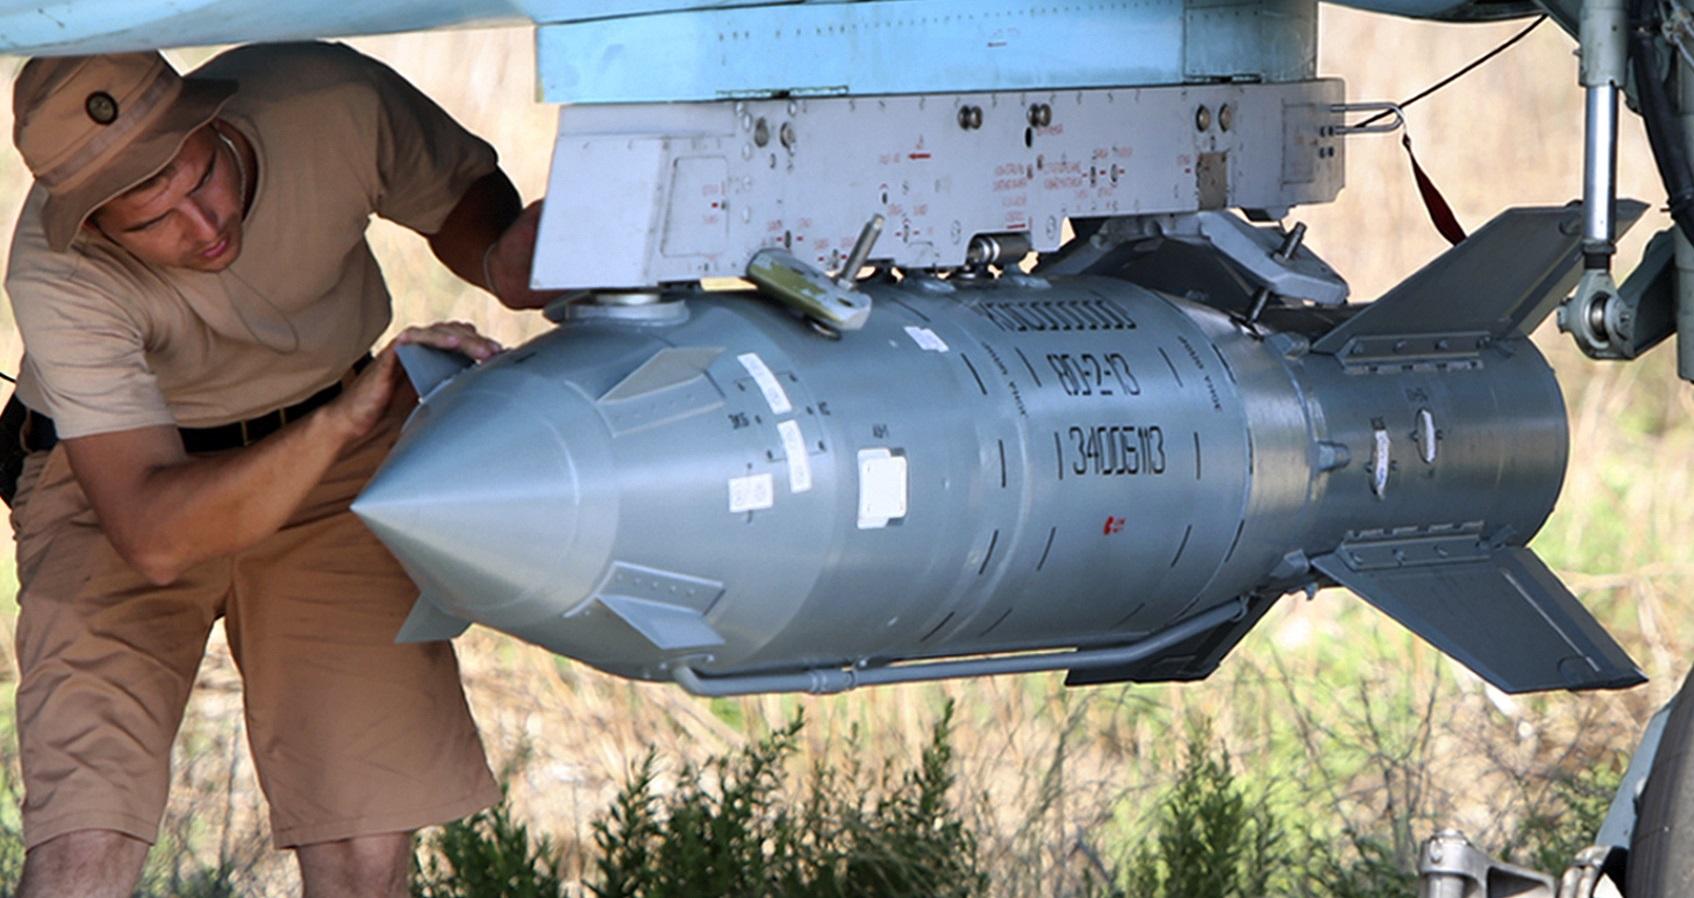 A KAB-500S PGM being inspected by a Russian technician in Syria (AP Photo/Alexander Kots, Komsomolskaya Pravda, Photo via AP)